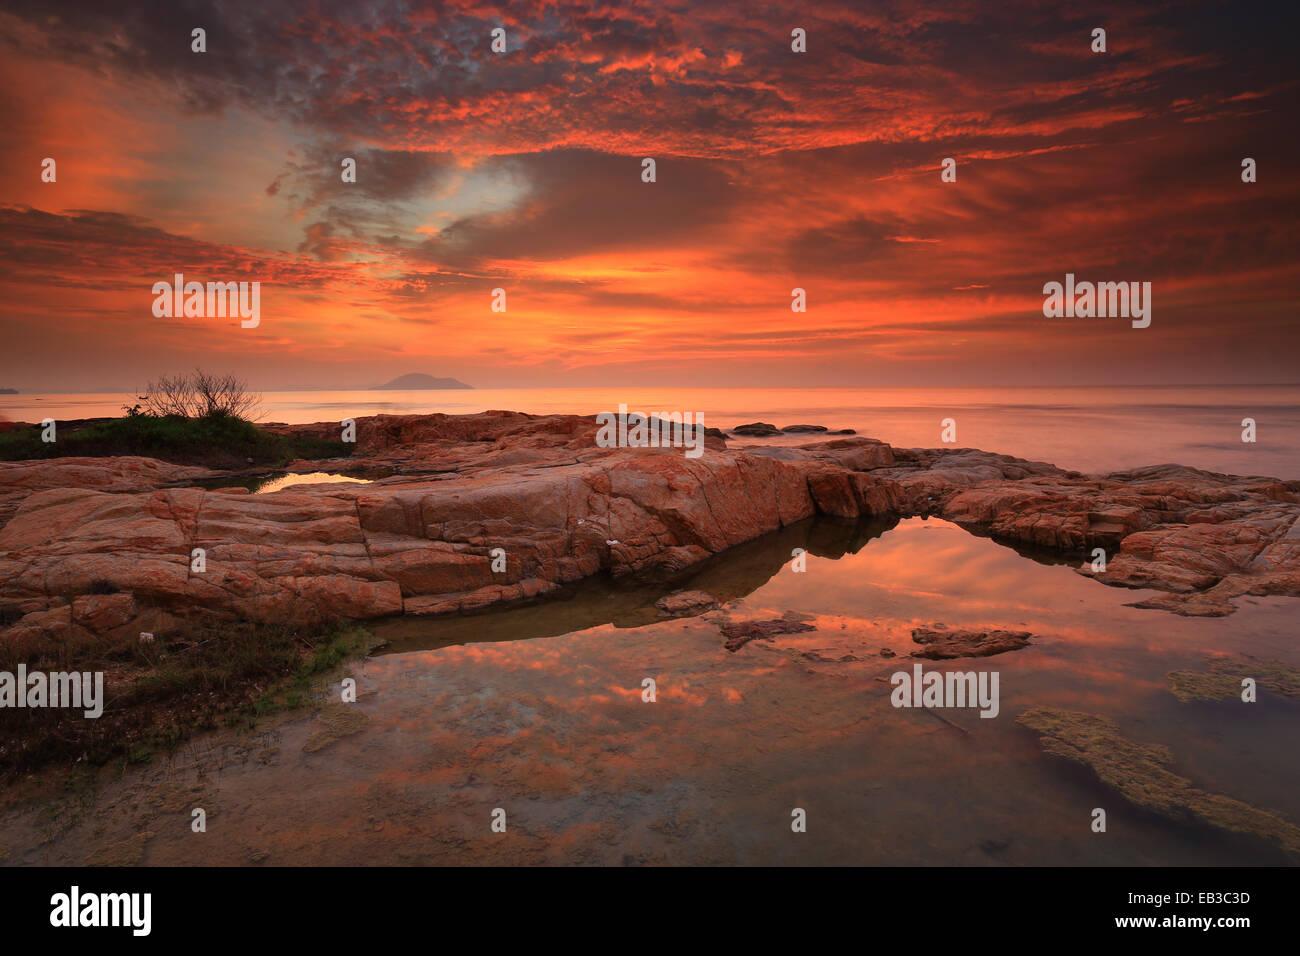 L'Indonésie, Singkawang colorés Photo Stock